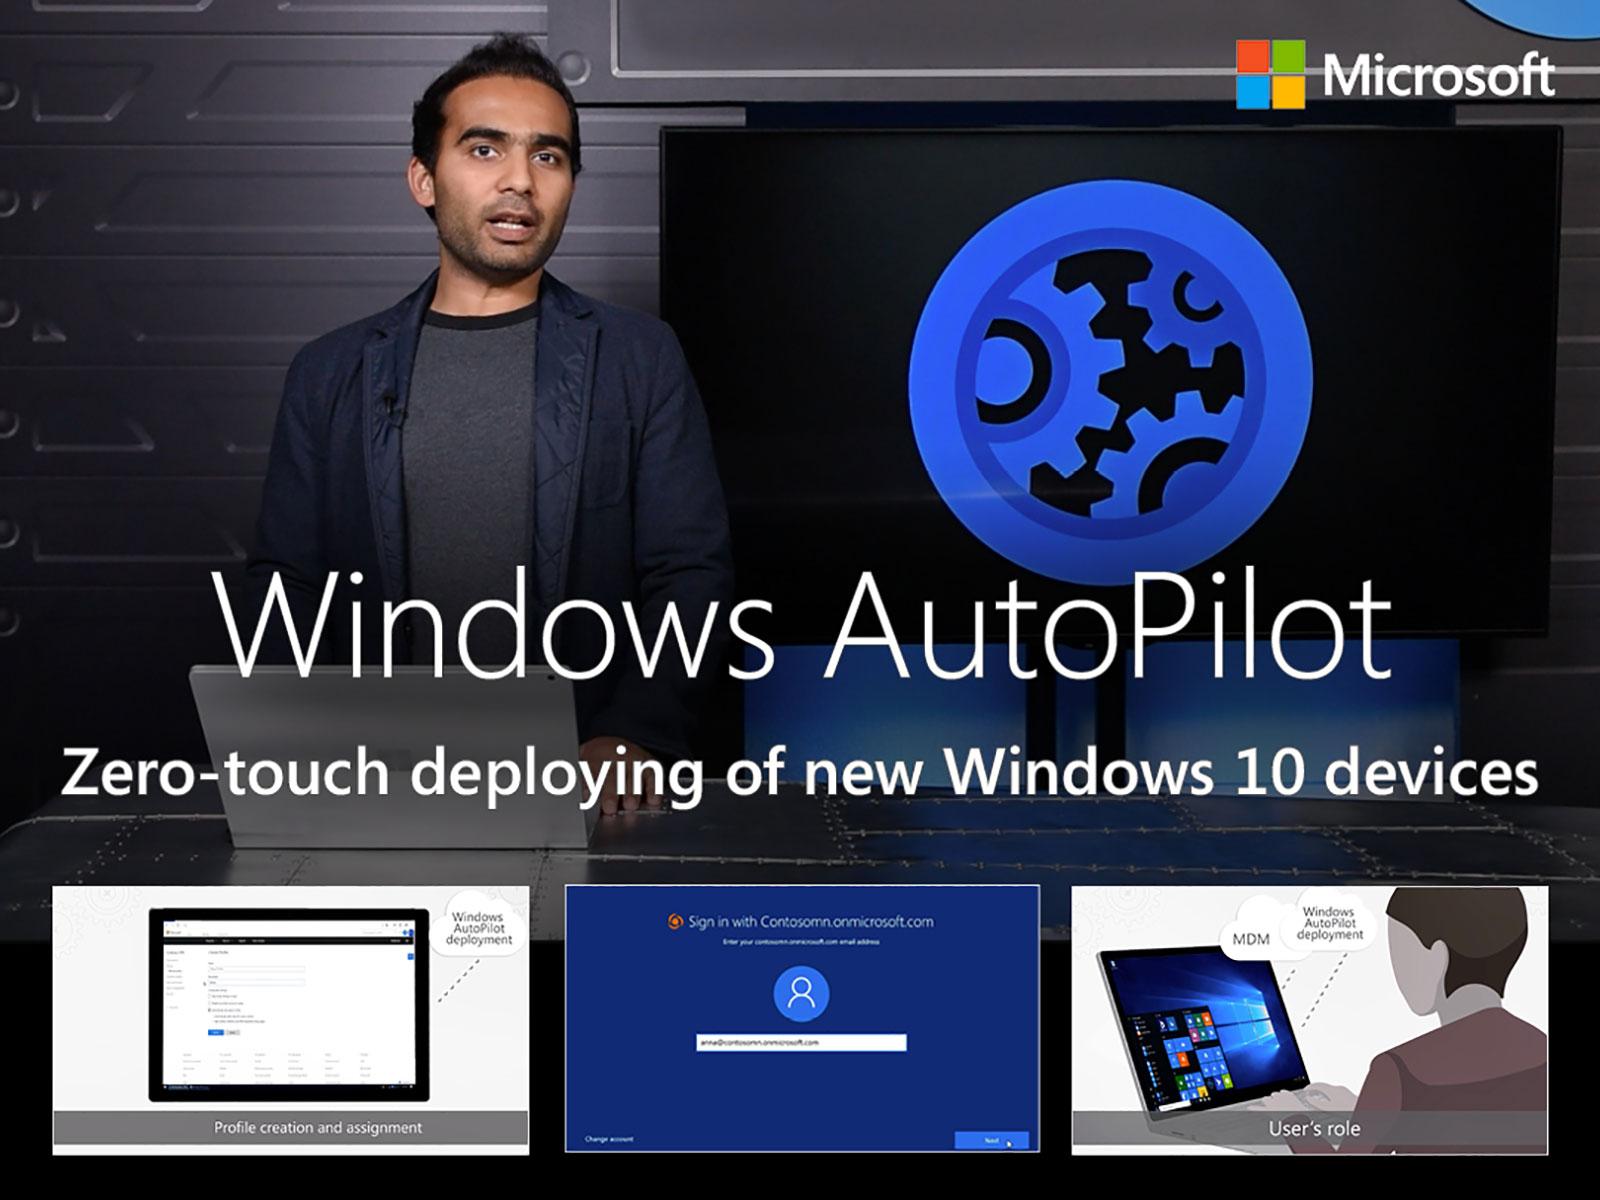 Artwork for Windows AutoPilot